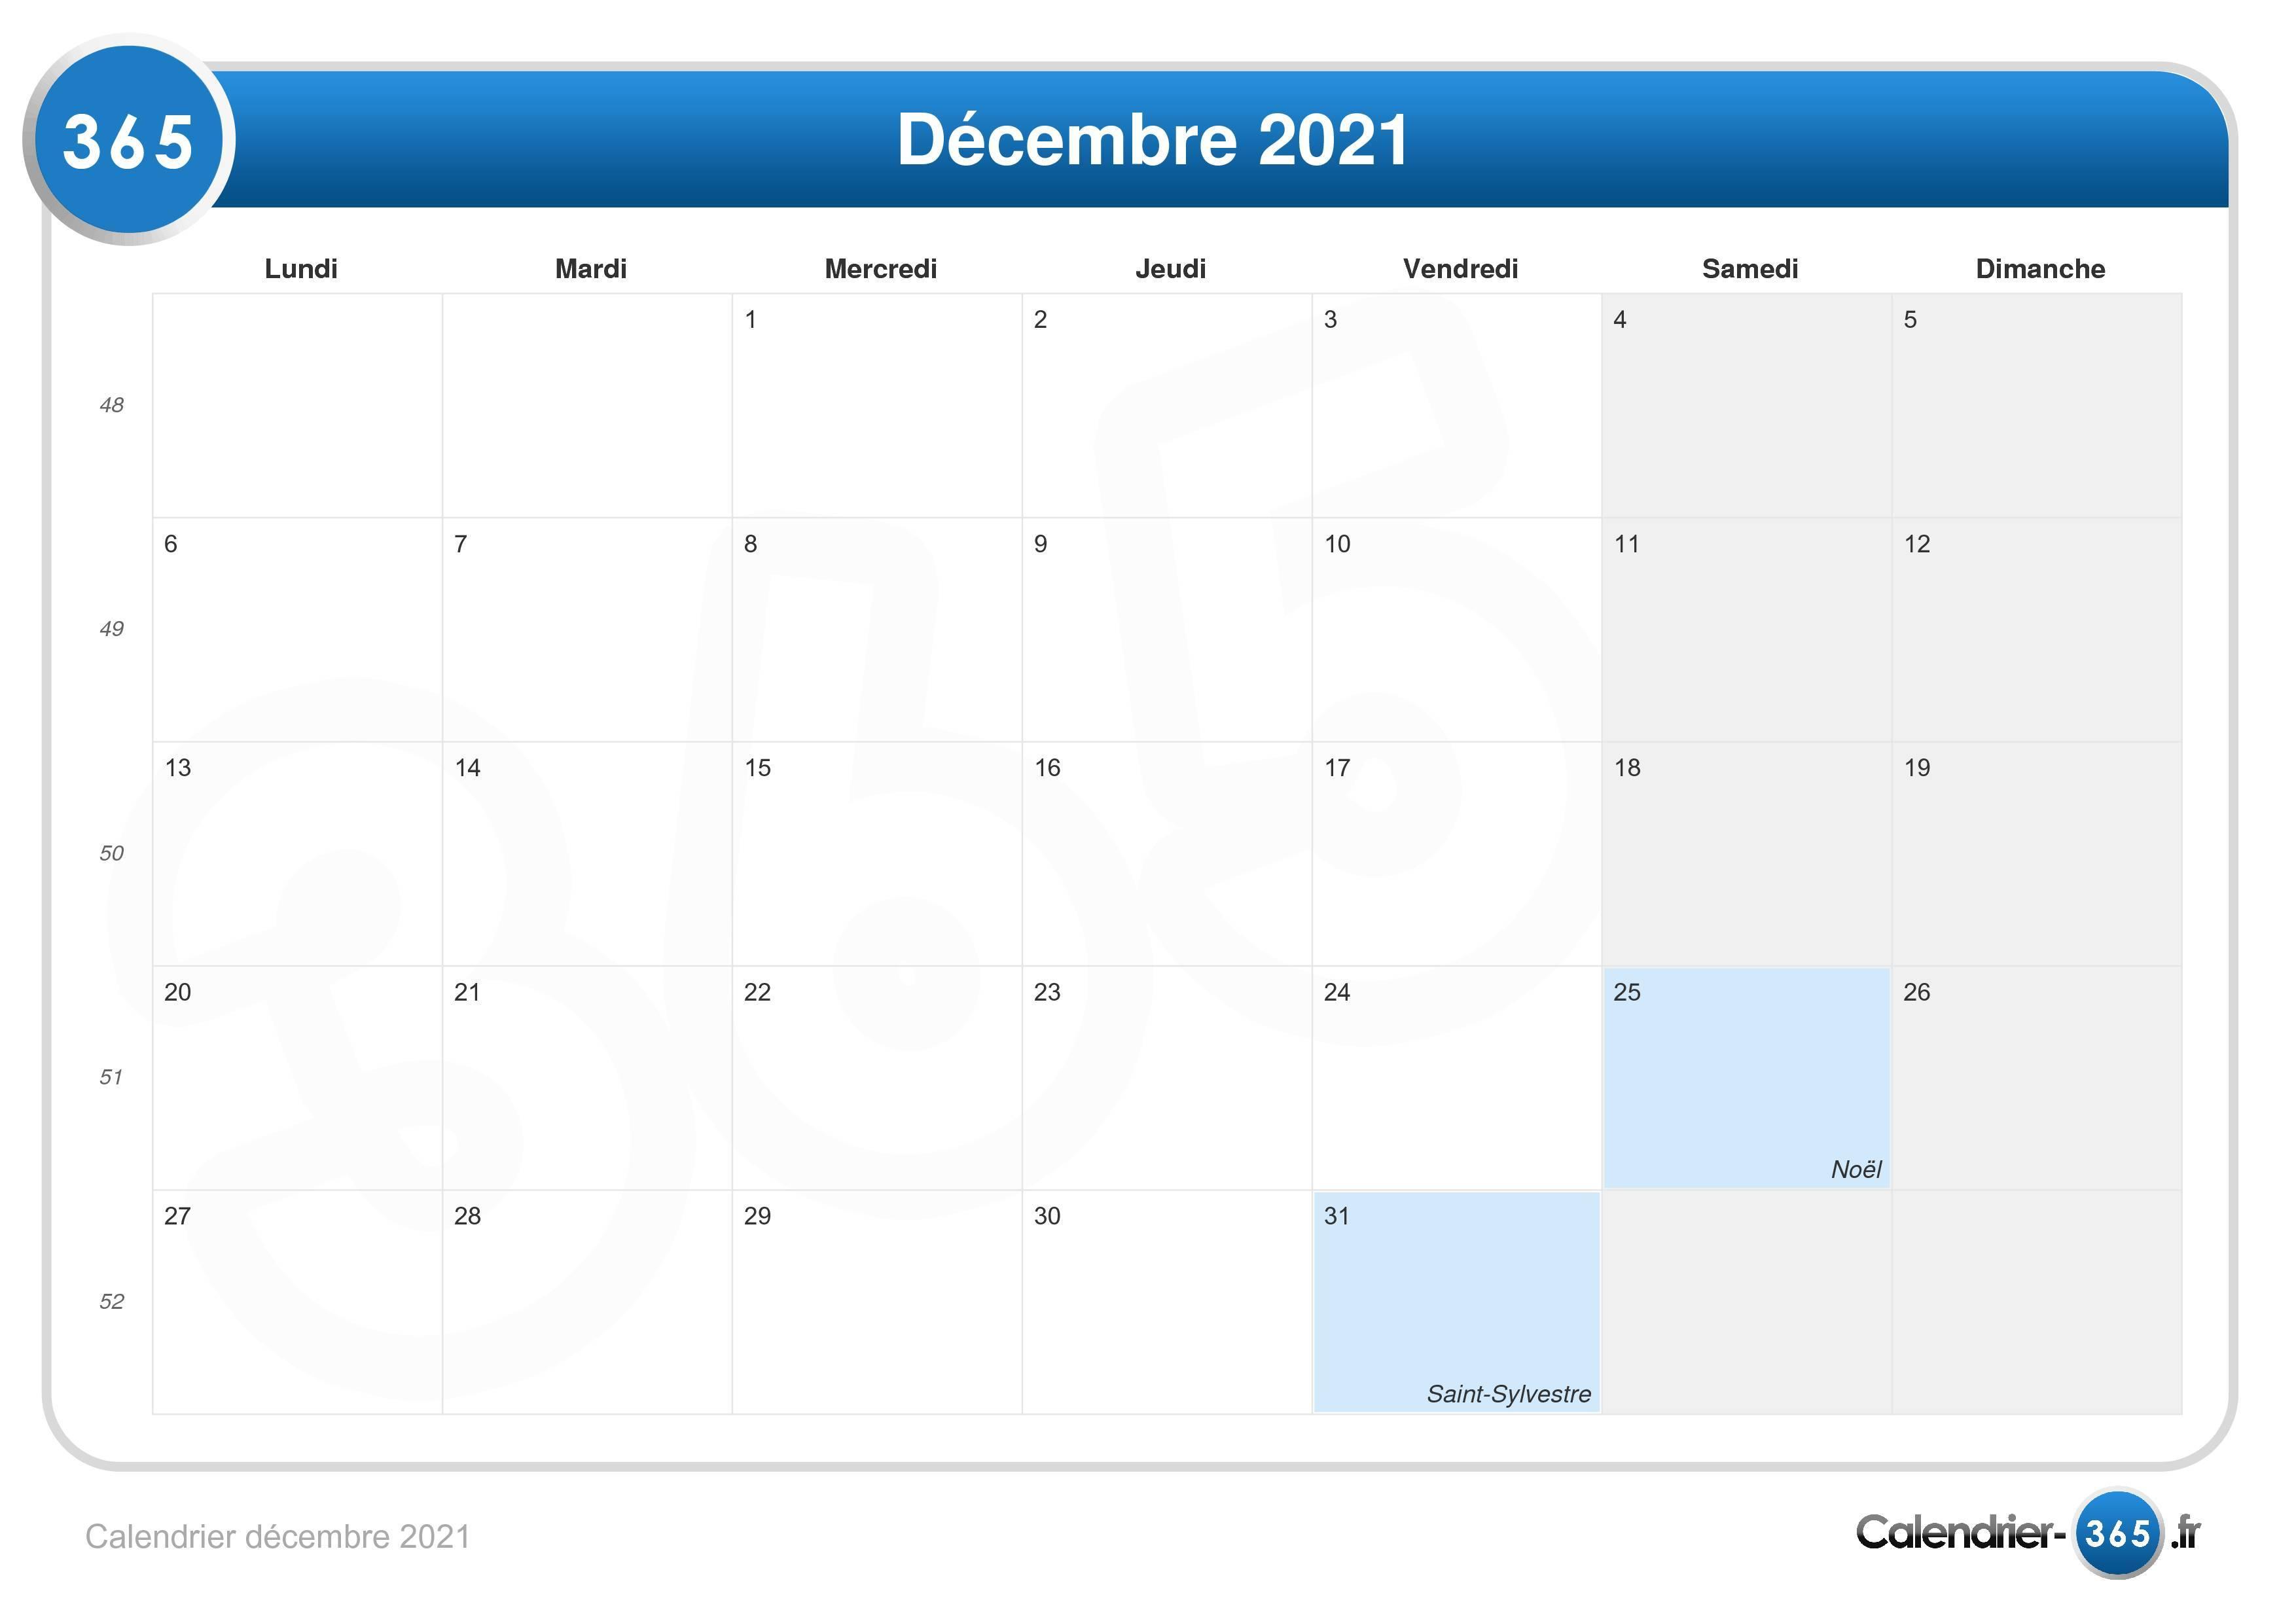 Calendrier Décembre 2021 Calendrier décembre 2021